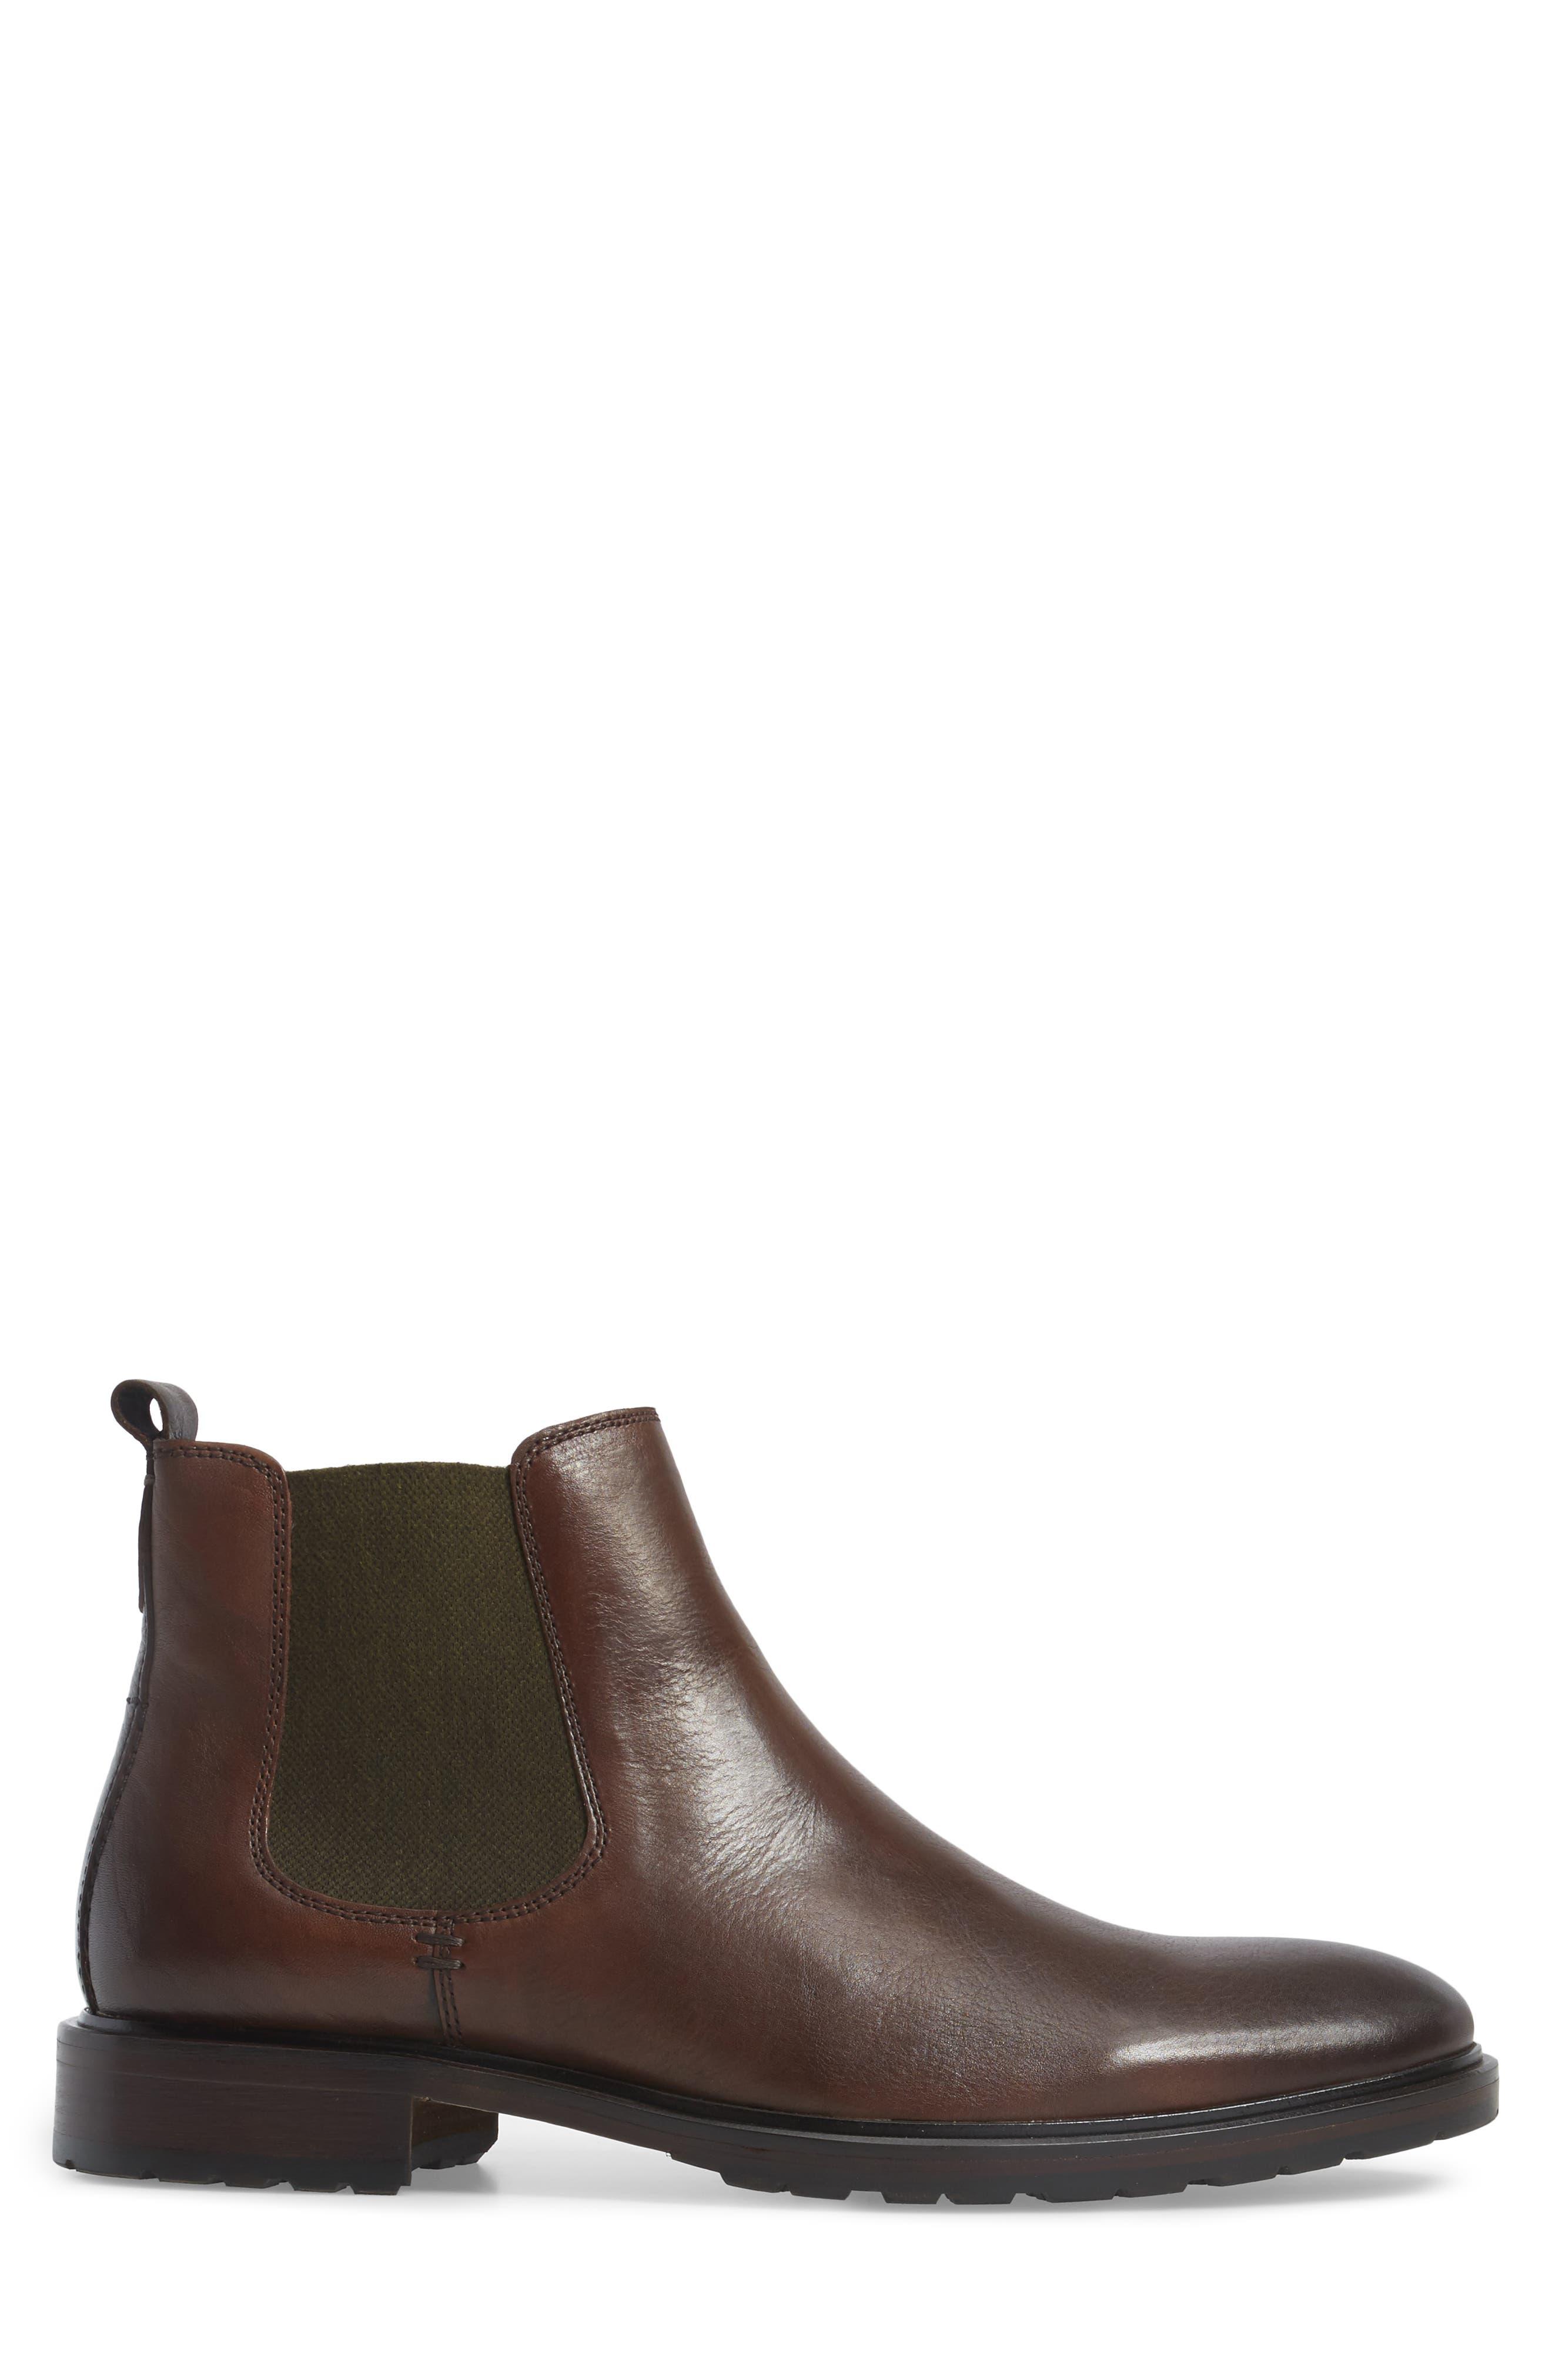 Myles Chelsea Boot,                             Alternate thumbnail 3, color,                             Mahogany Leather